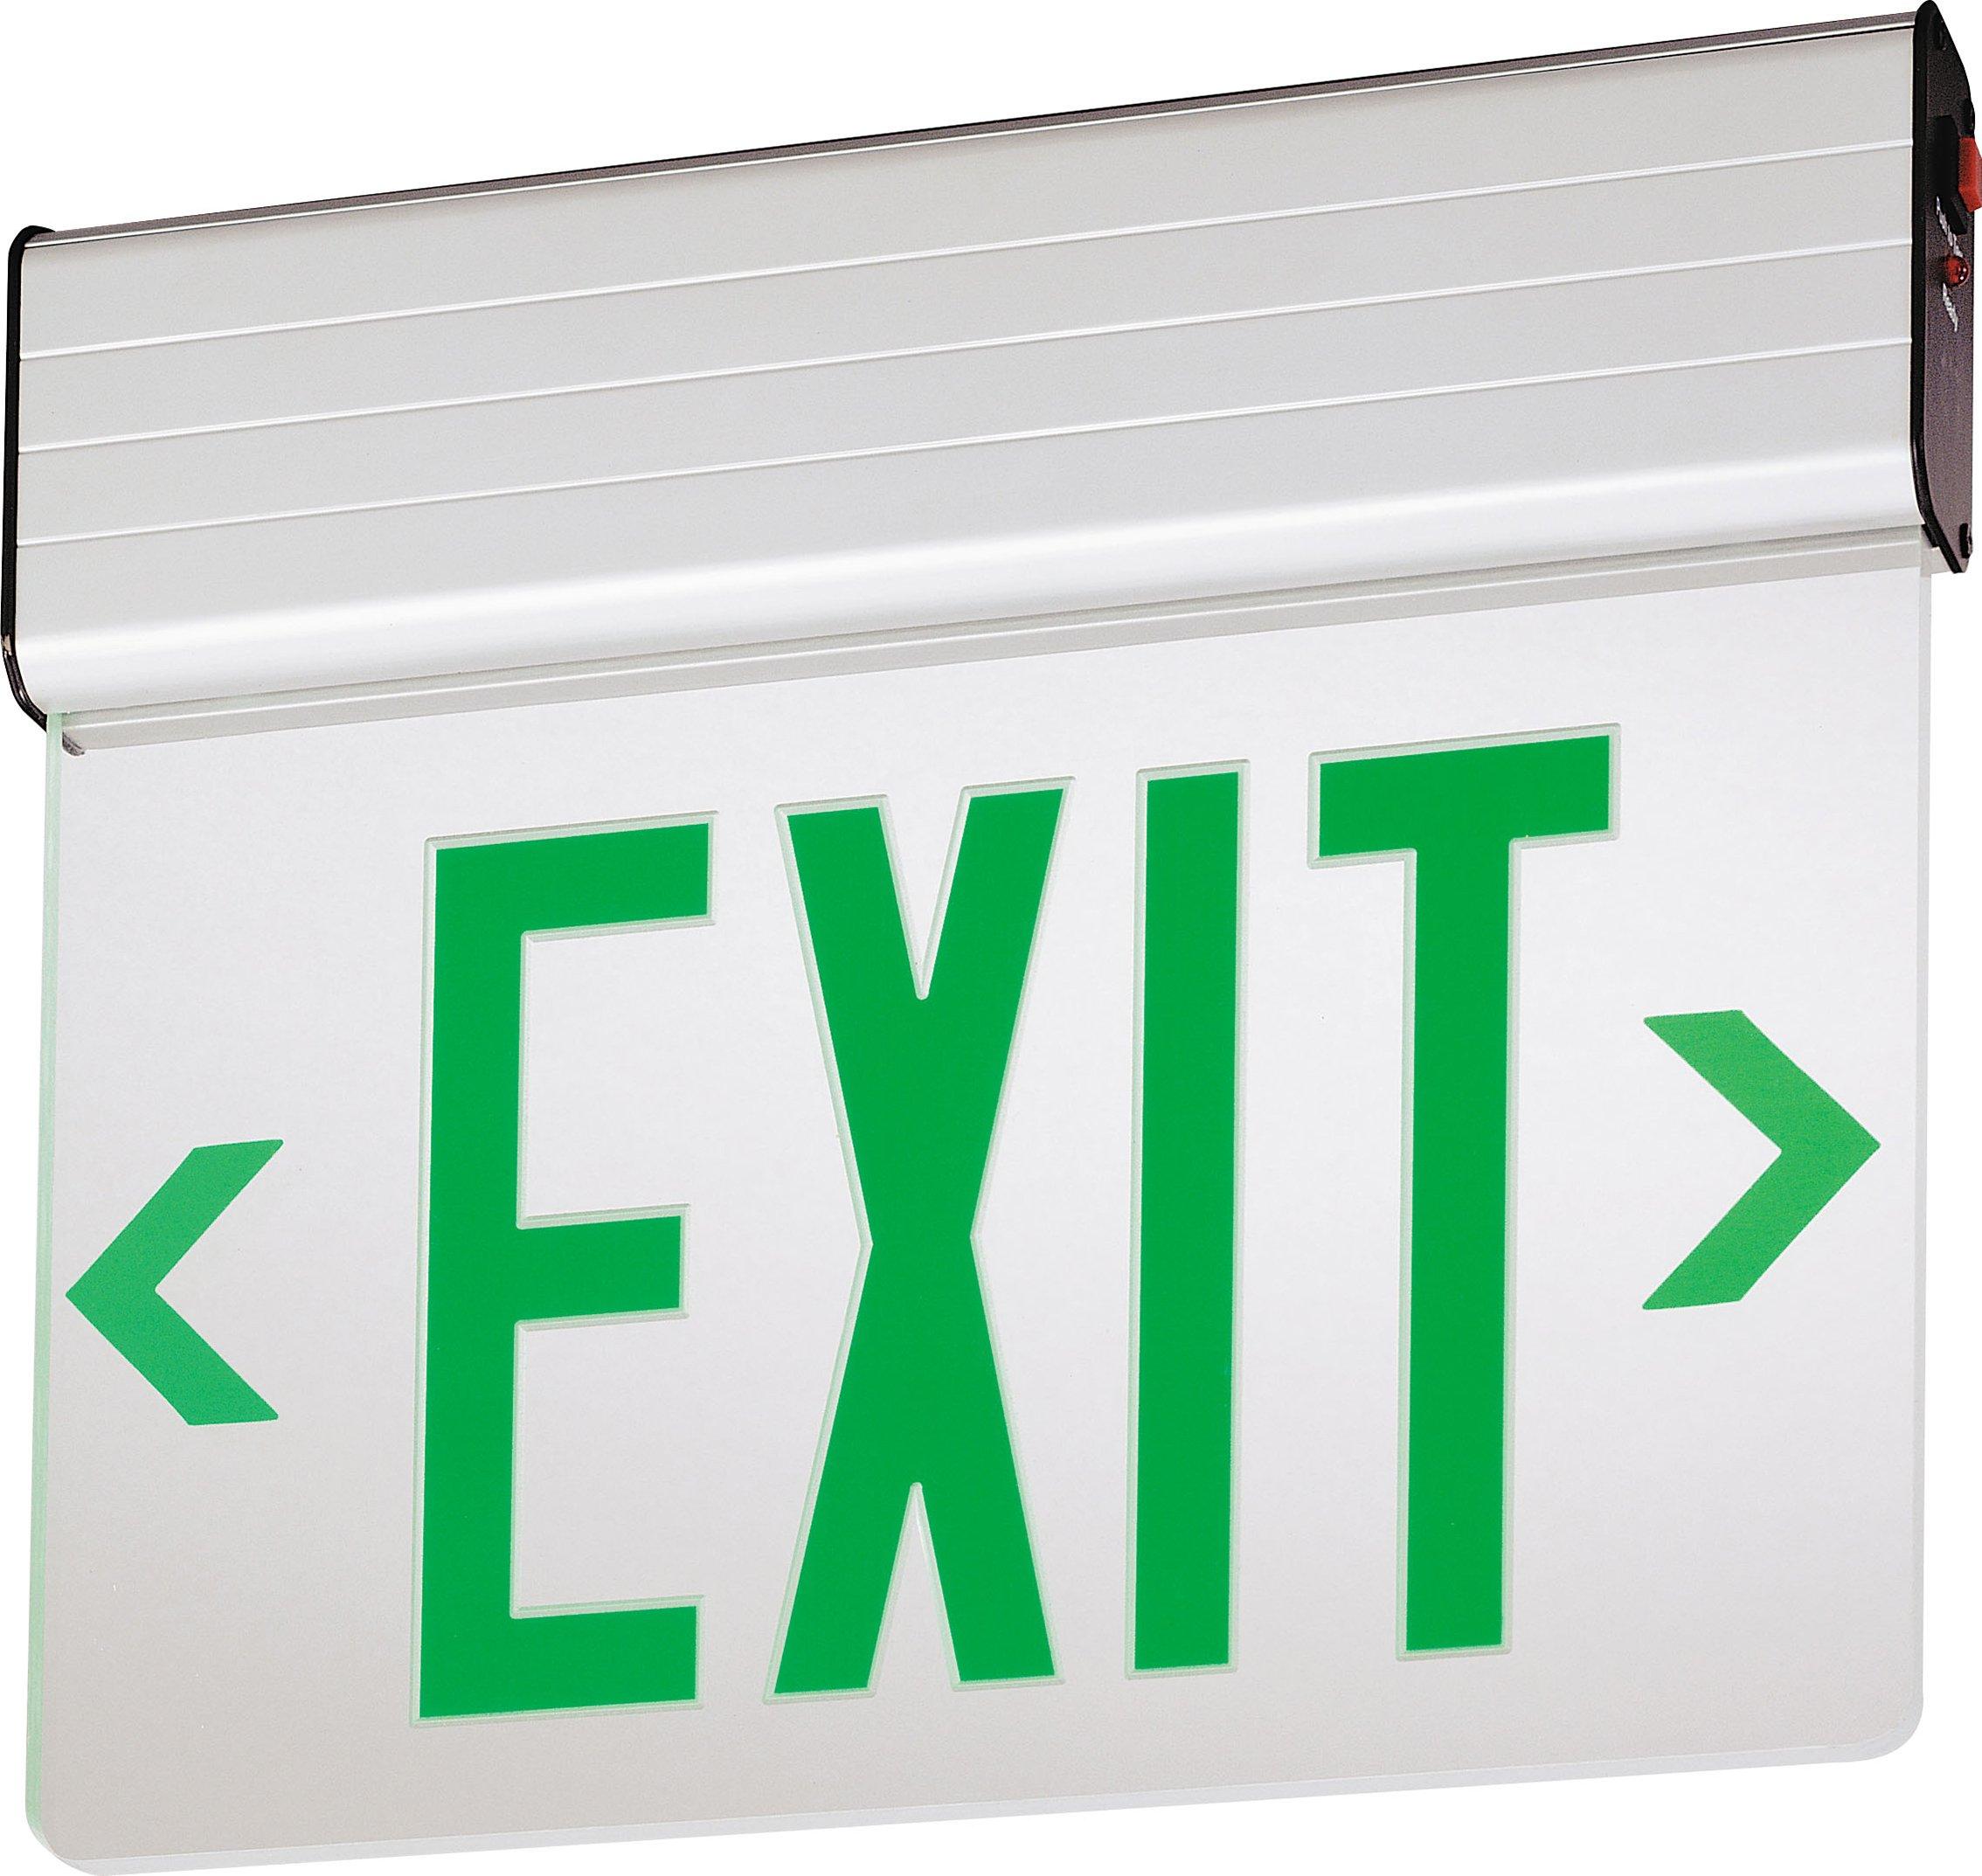 Lithonia Lighting EDG 2 G EL M6 Aluminum LED Emergency Exit Sign by Lithonia Lighting